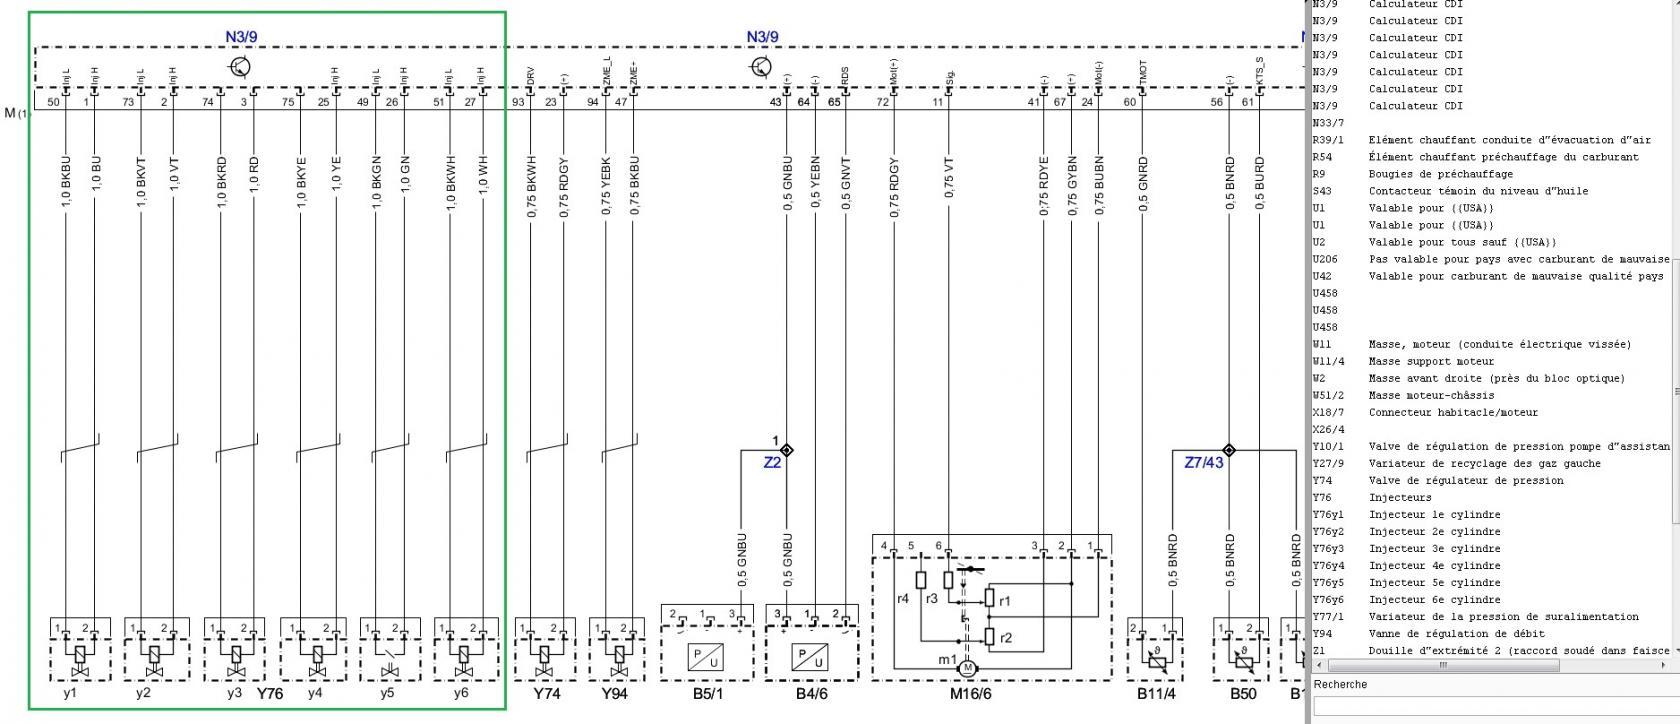 cablage-injecteurs-2-WDC1641221A057719.jpeg